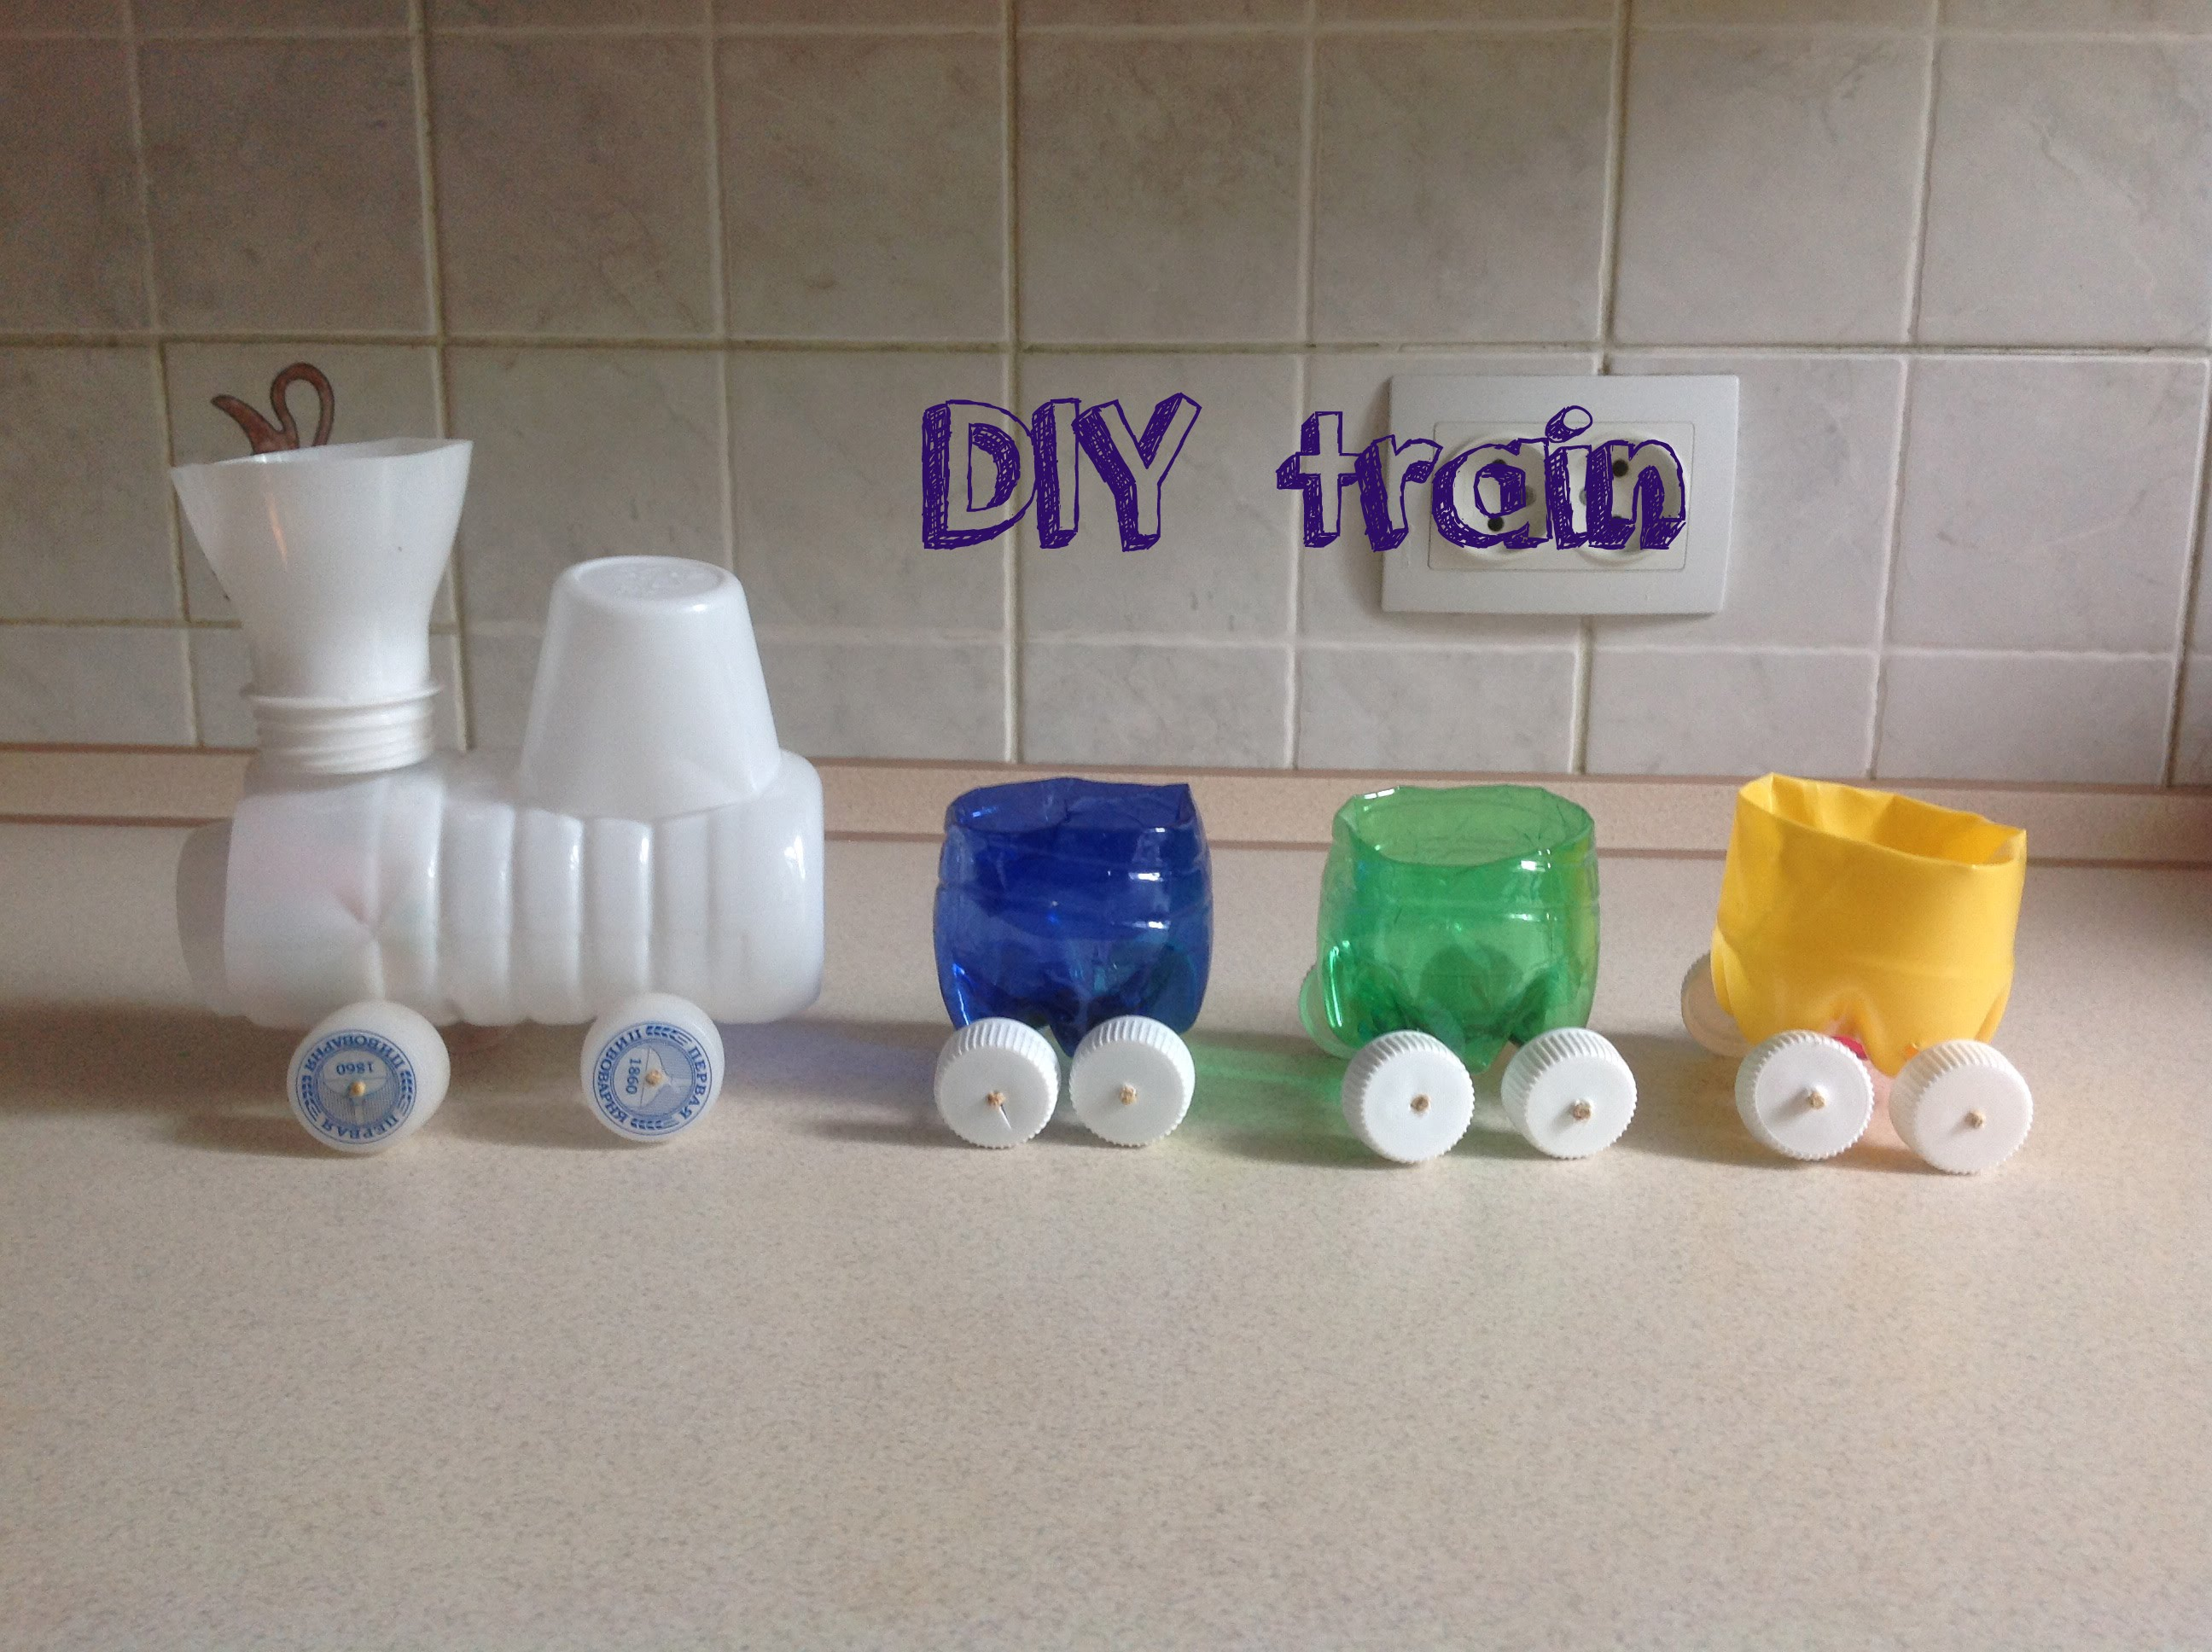 Train Diy Plastic Bottles Crafts For Kids Downline4life Content